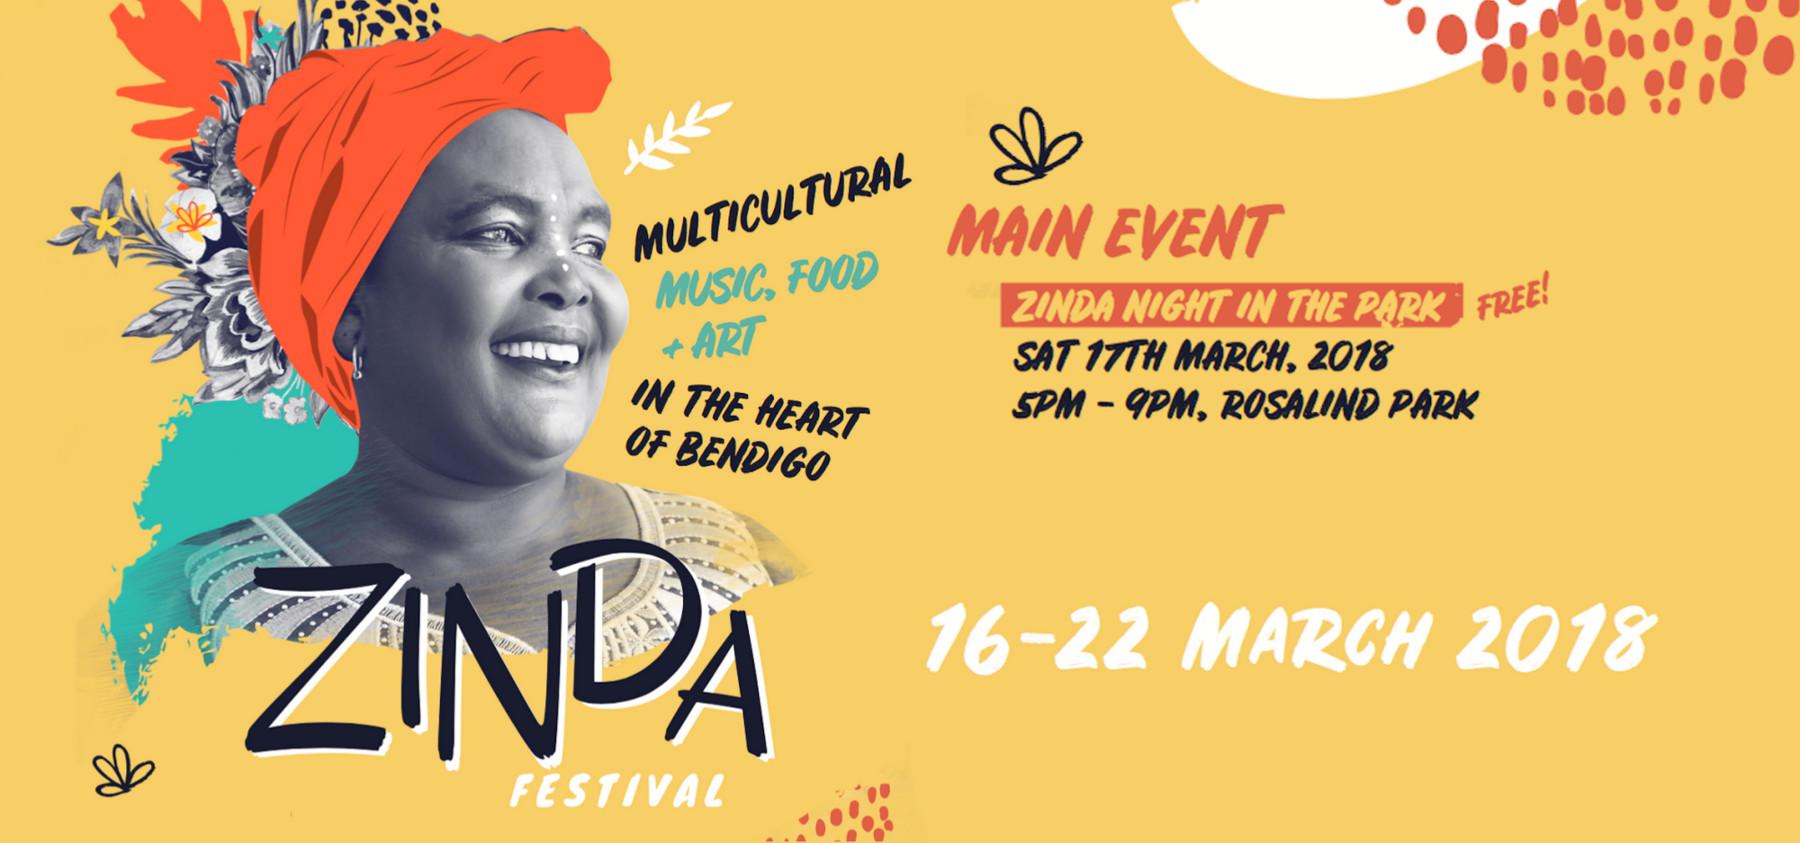 Zinda festival main event